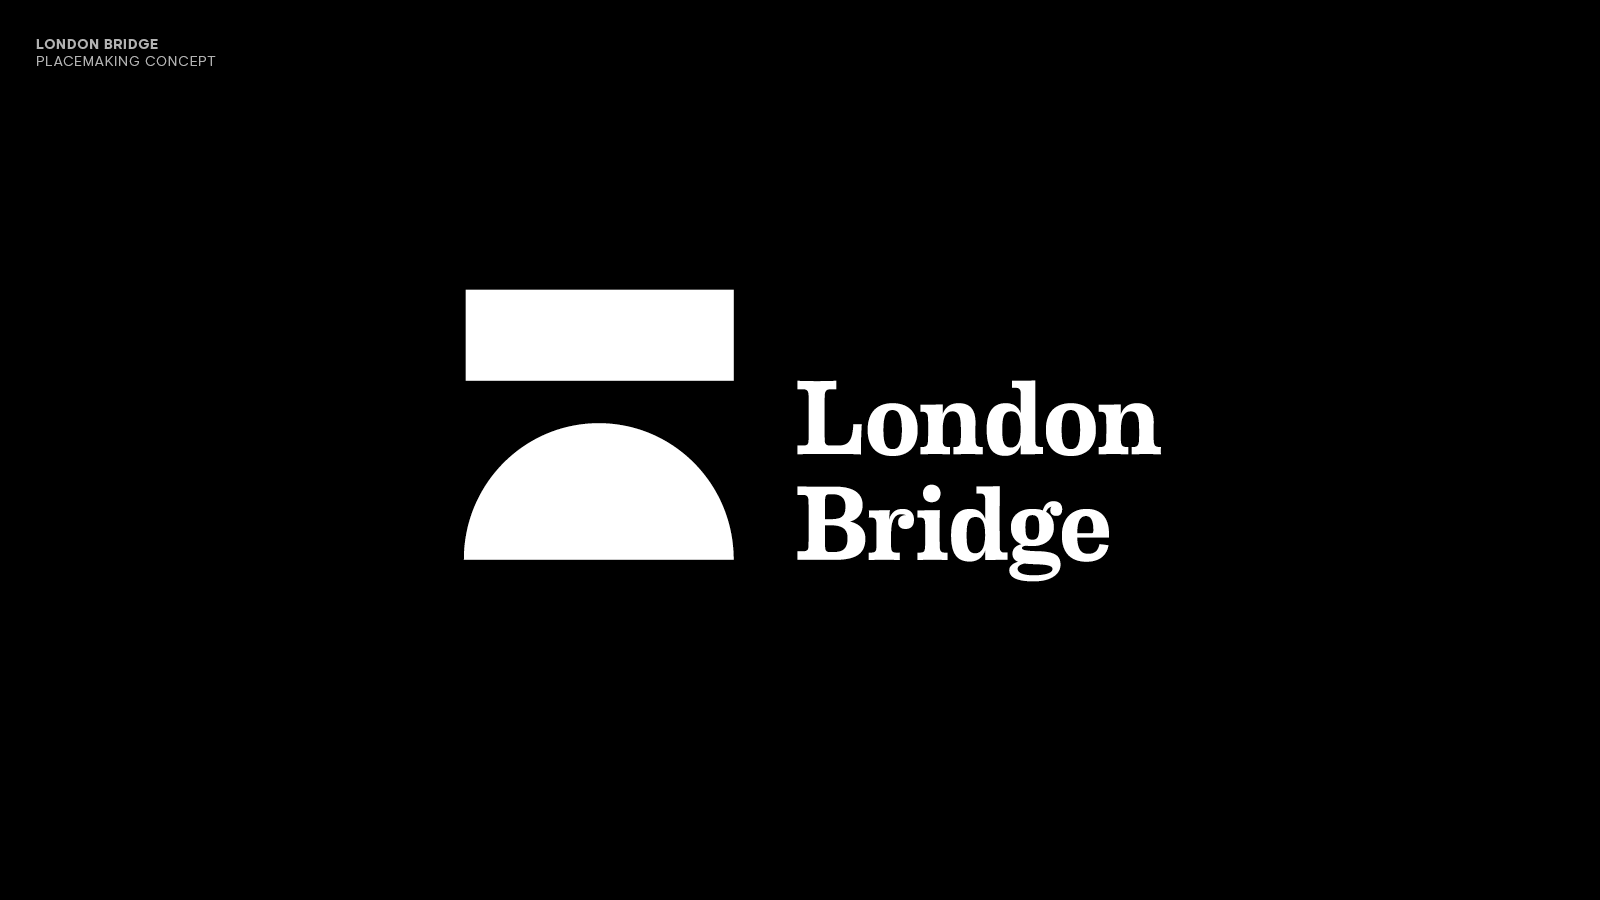 logos-designer-brand-identity-projects-graphics-studio-milton-keynes-london-11